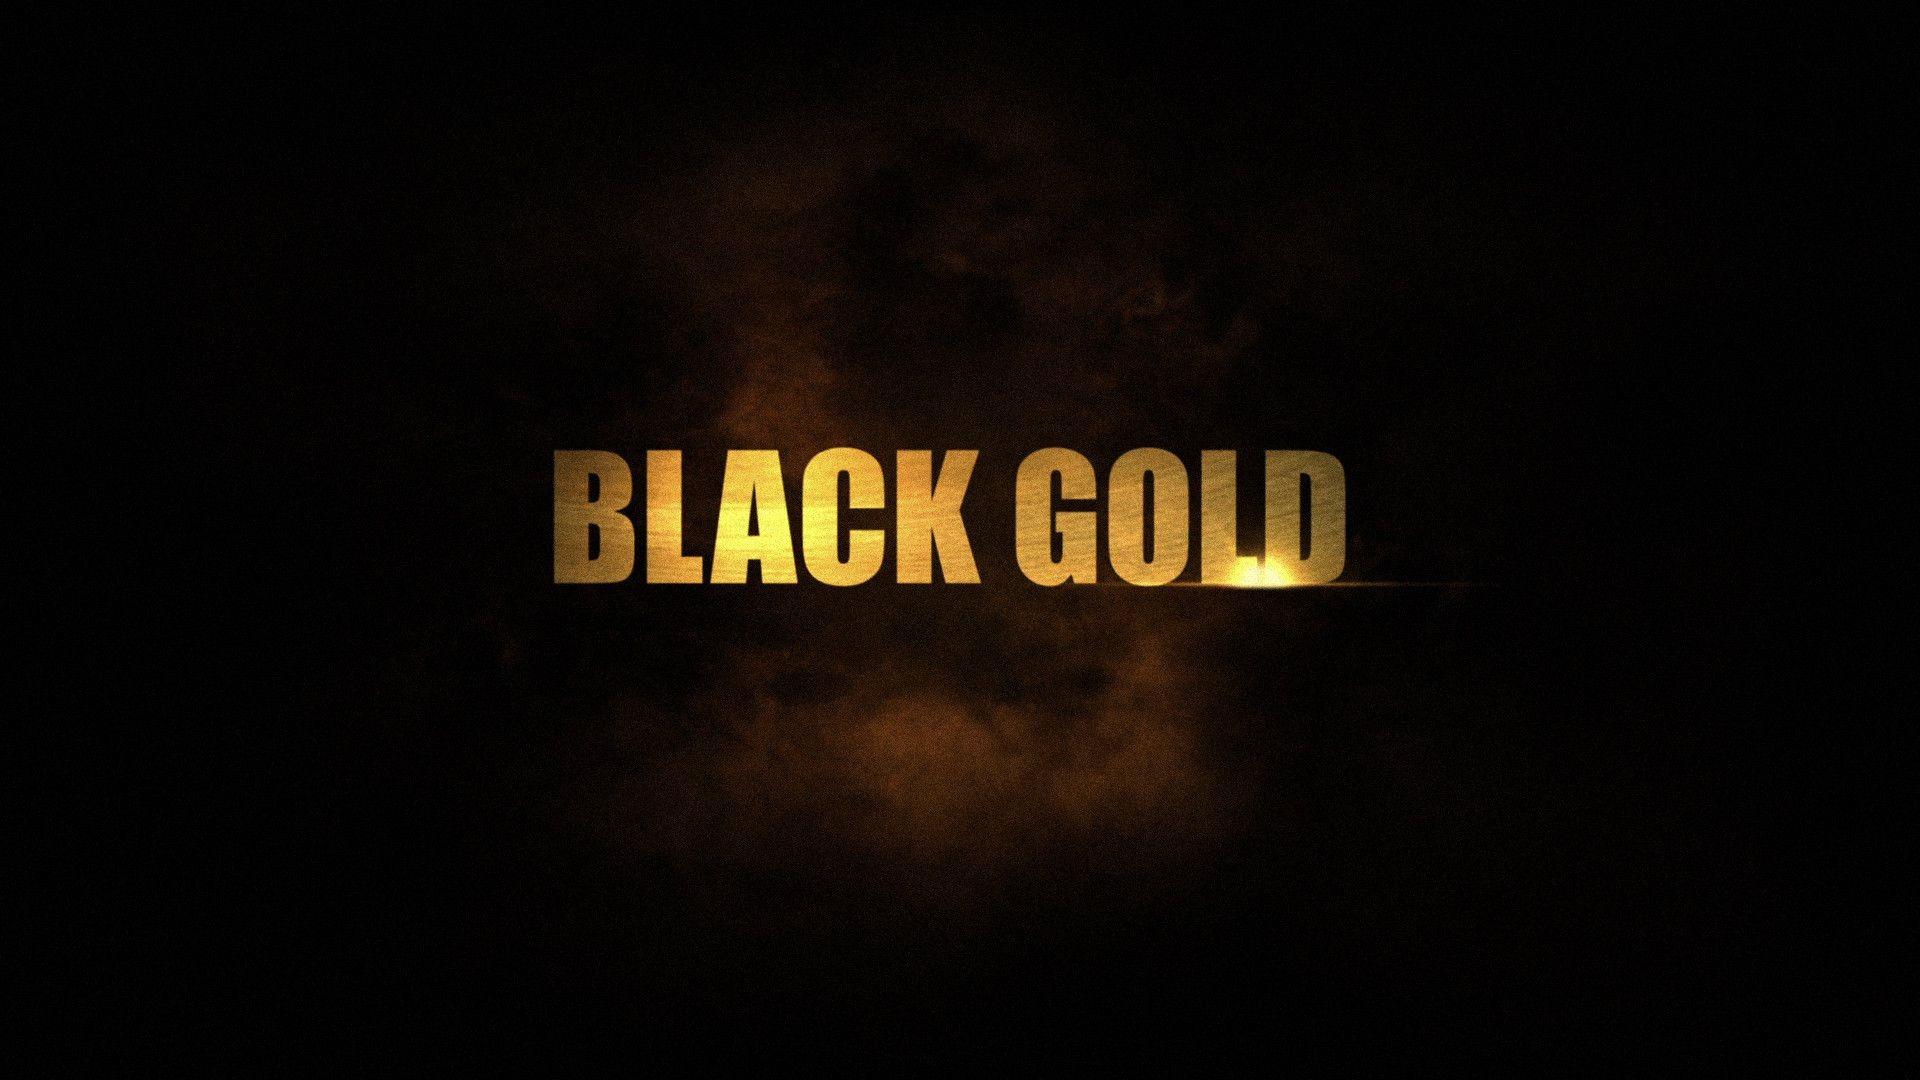 Black and Gold Glitter Wallpaper Black Gold Fall Random Pins 1904×1096  Black Gold Wallpaper